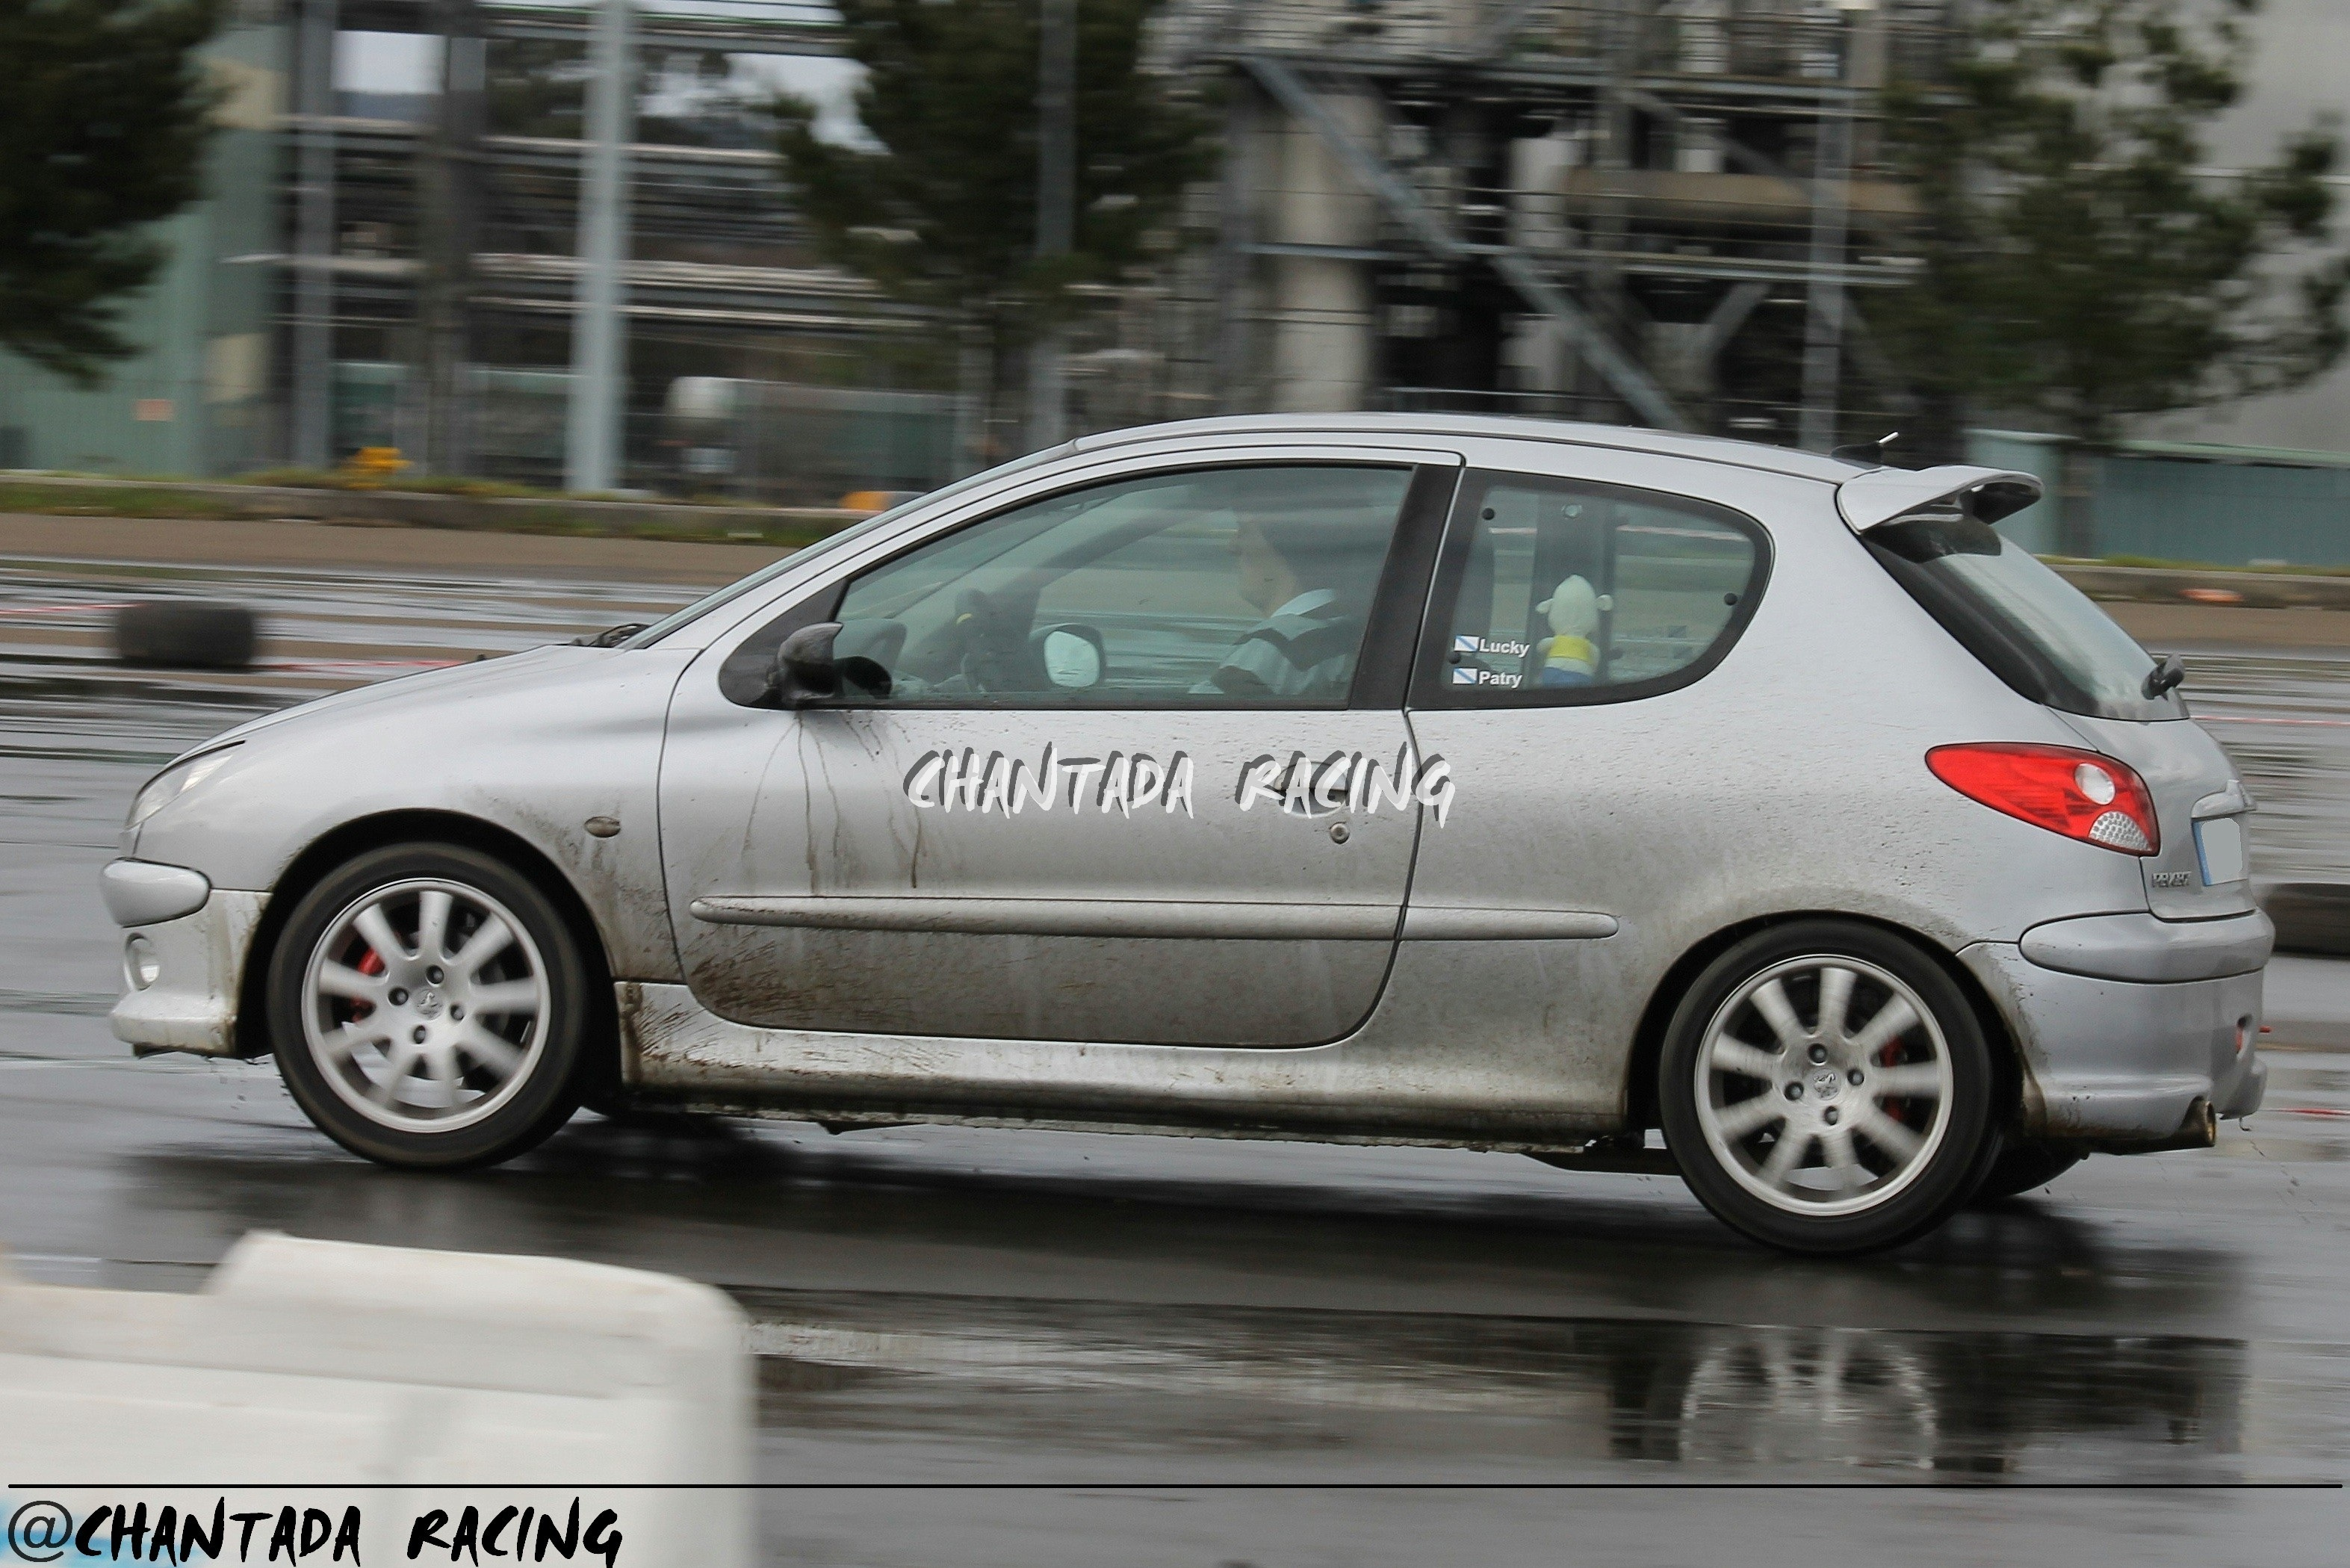 Macroquedada Racing de Cerceda